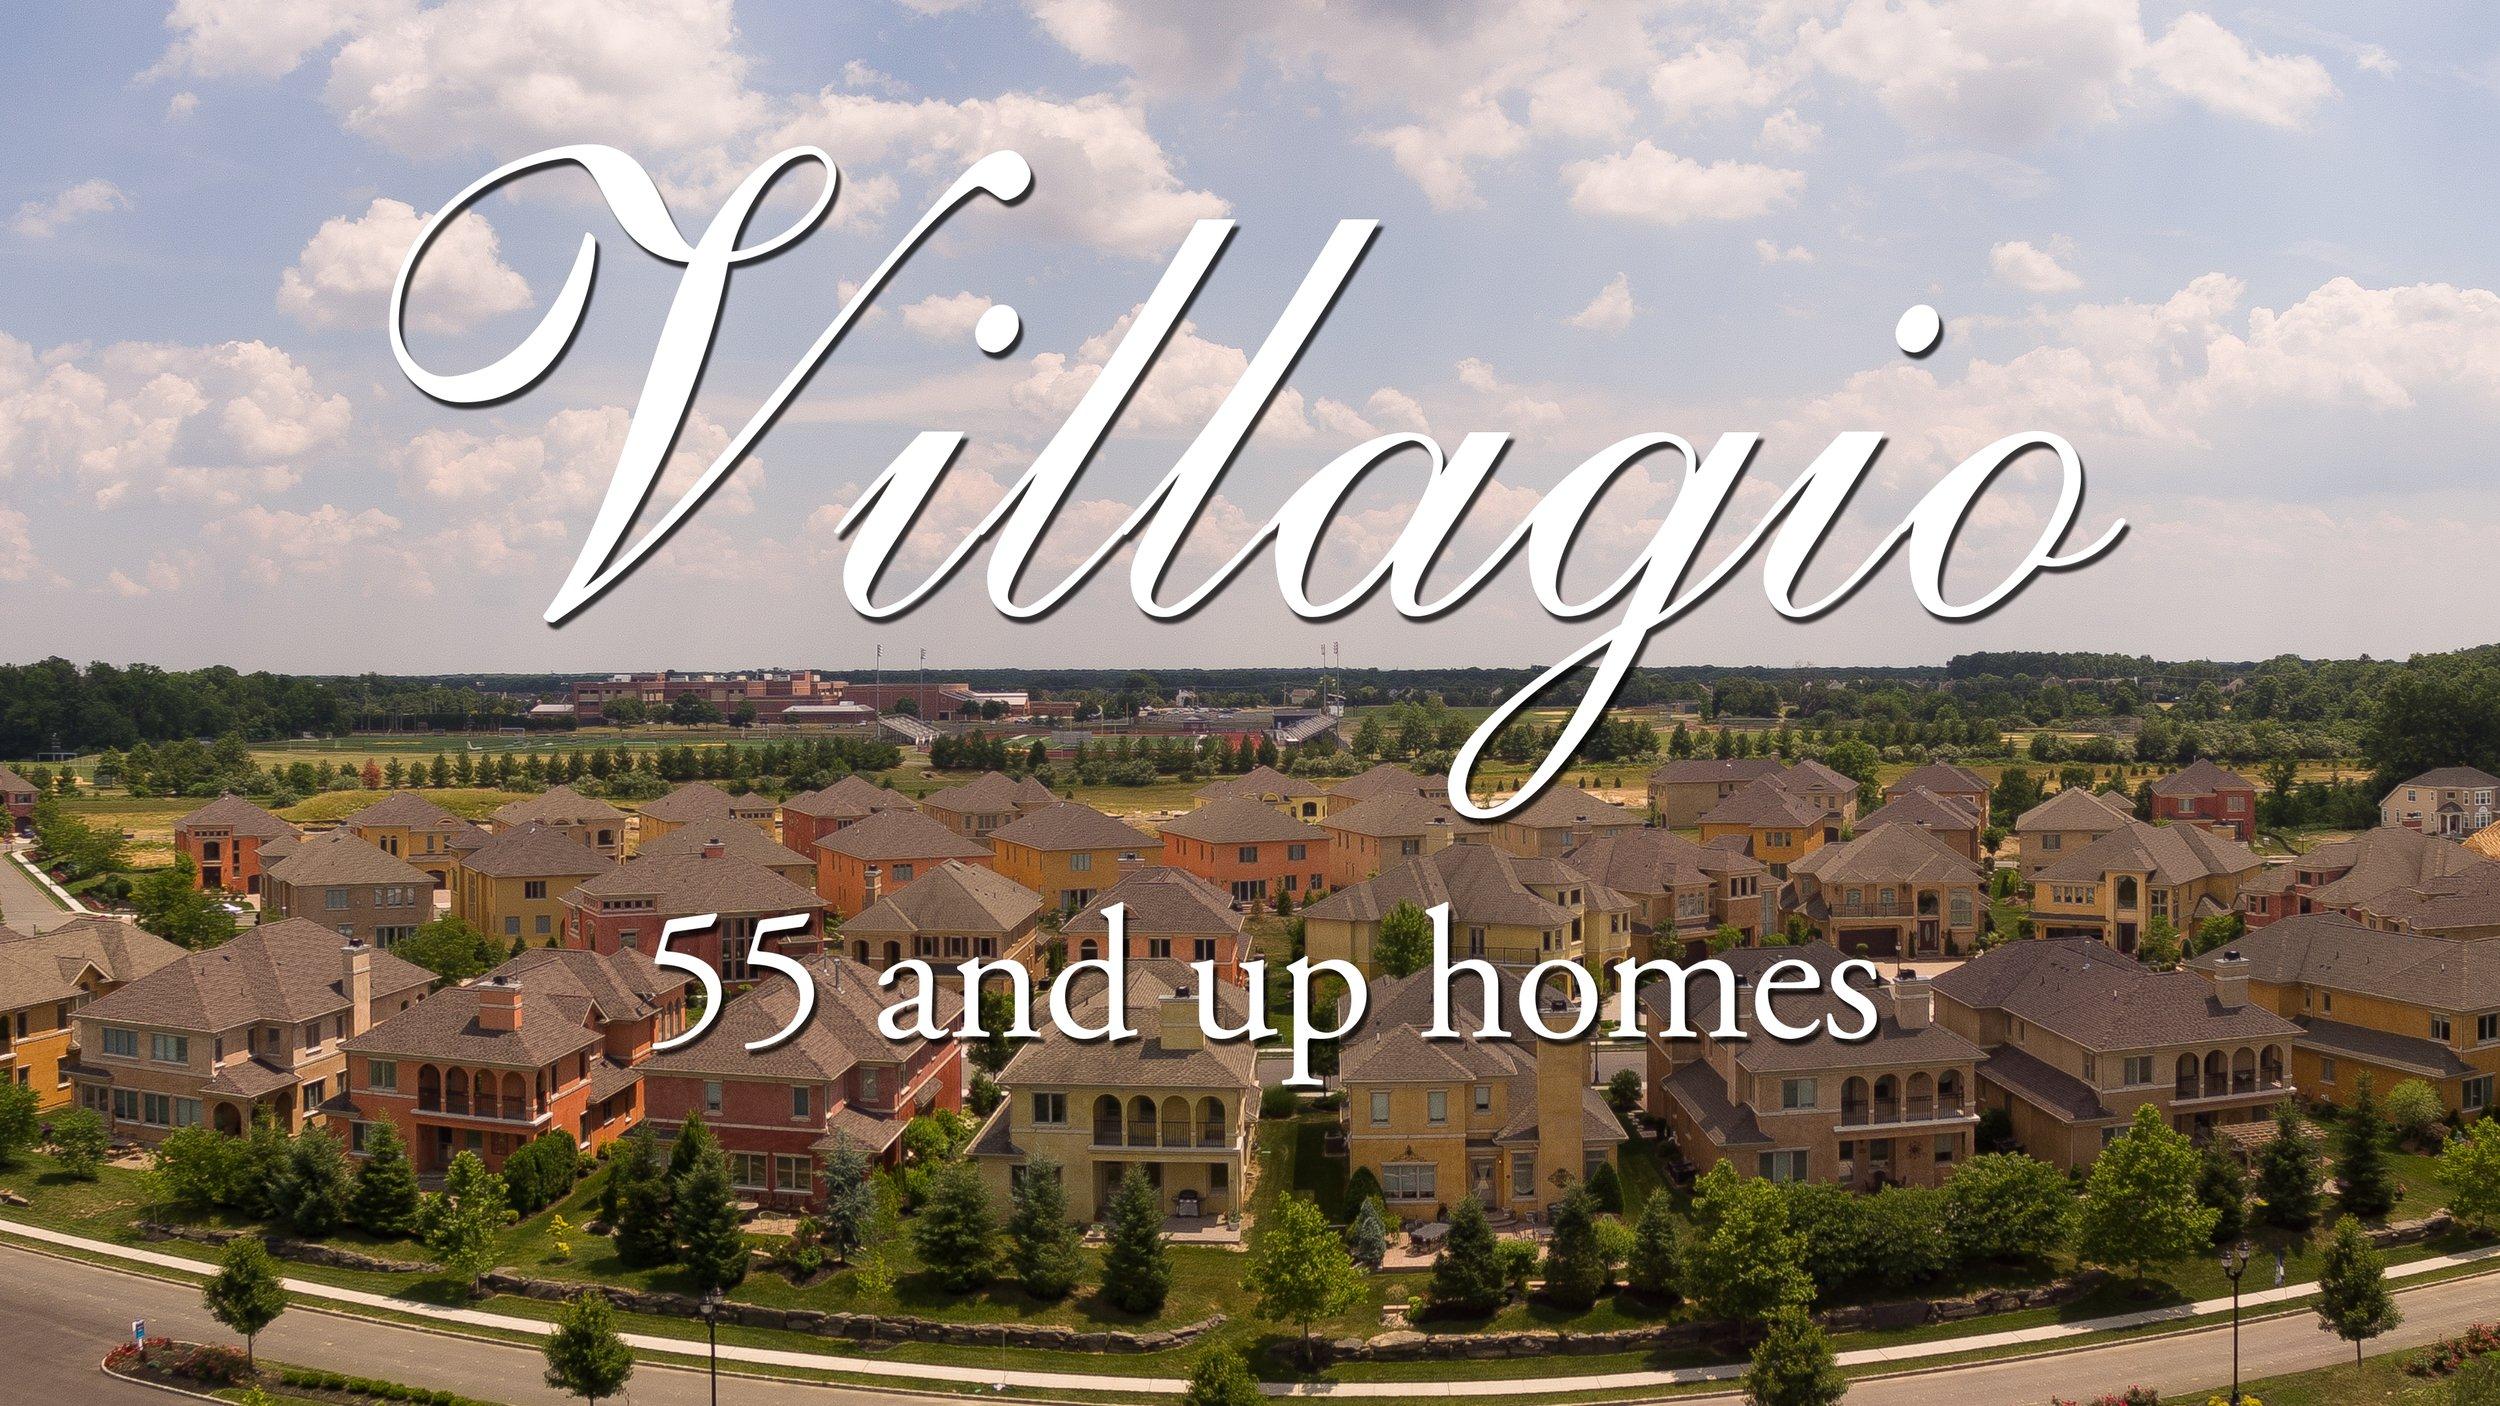 villagio poster.jpg